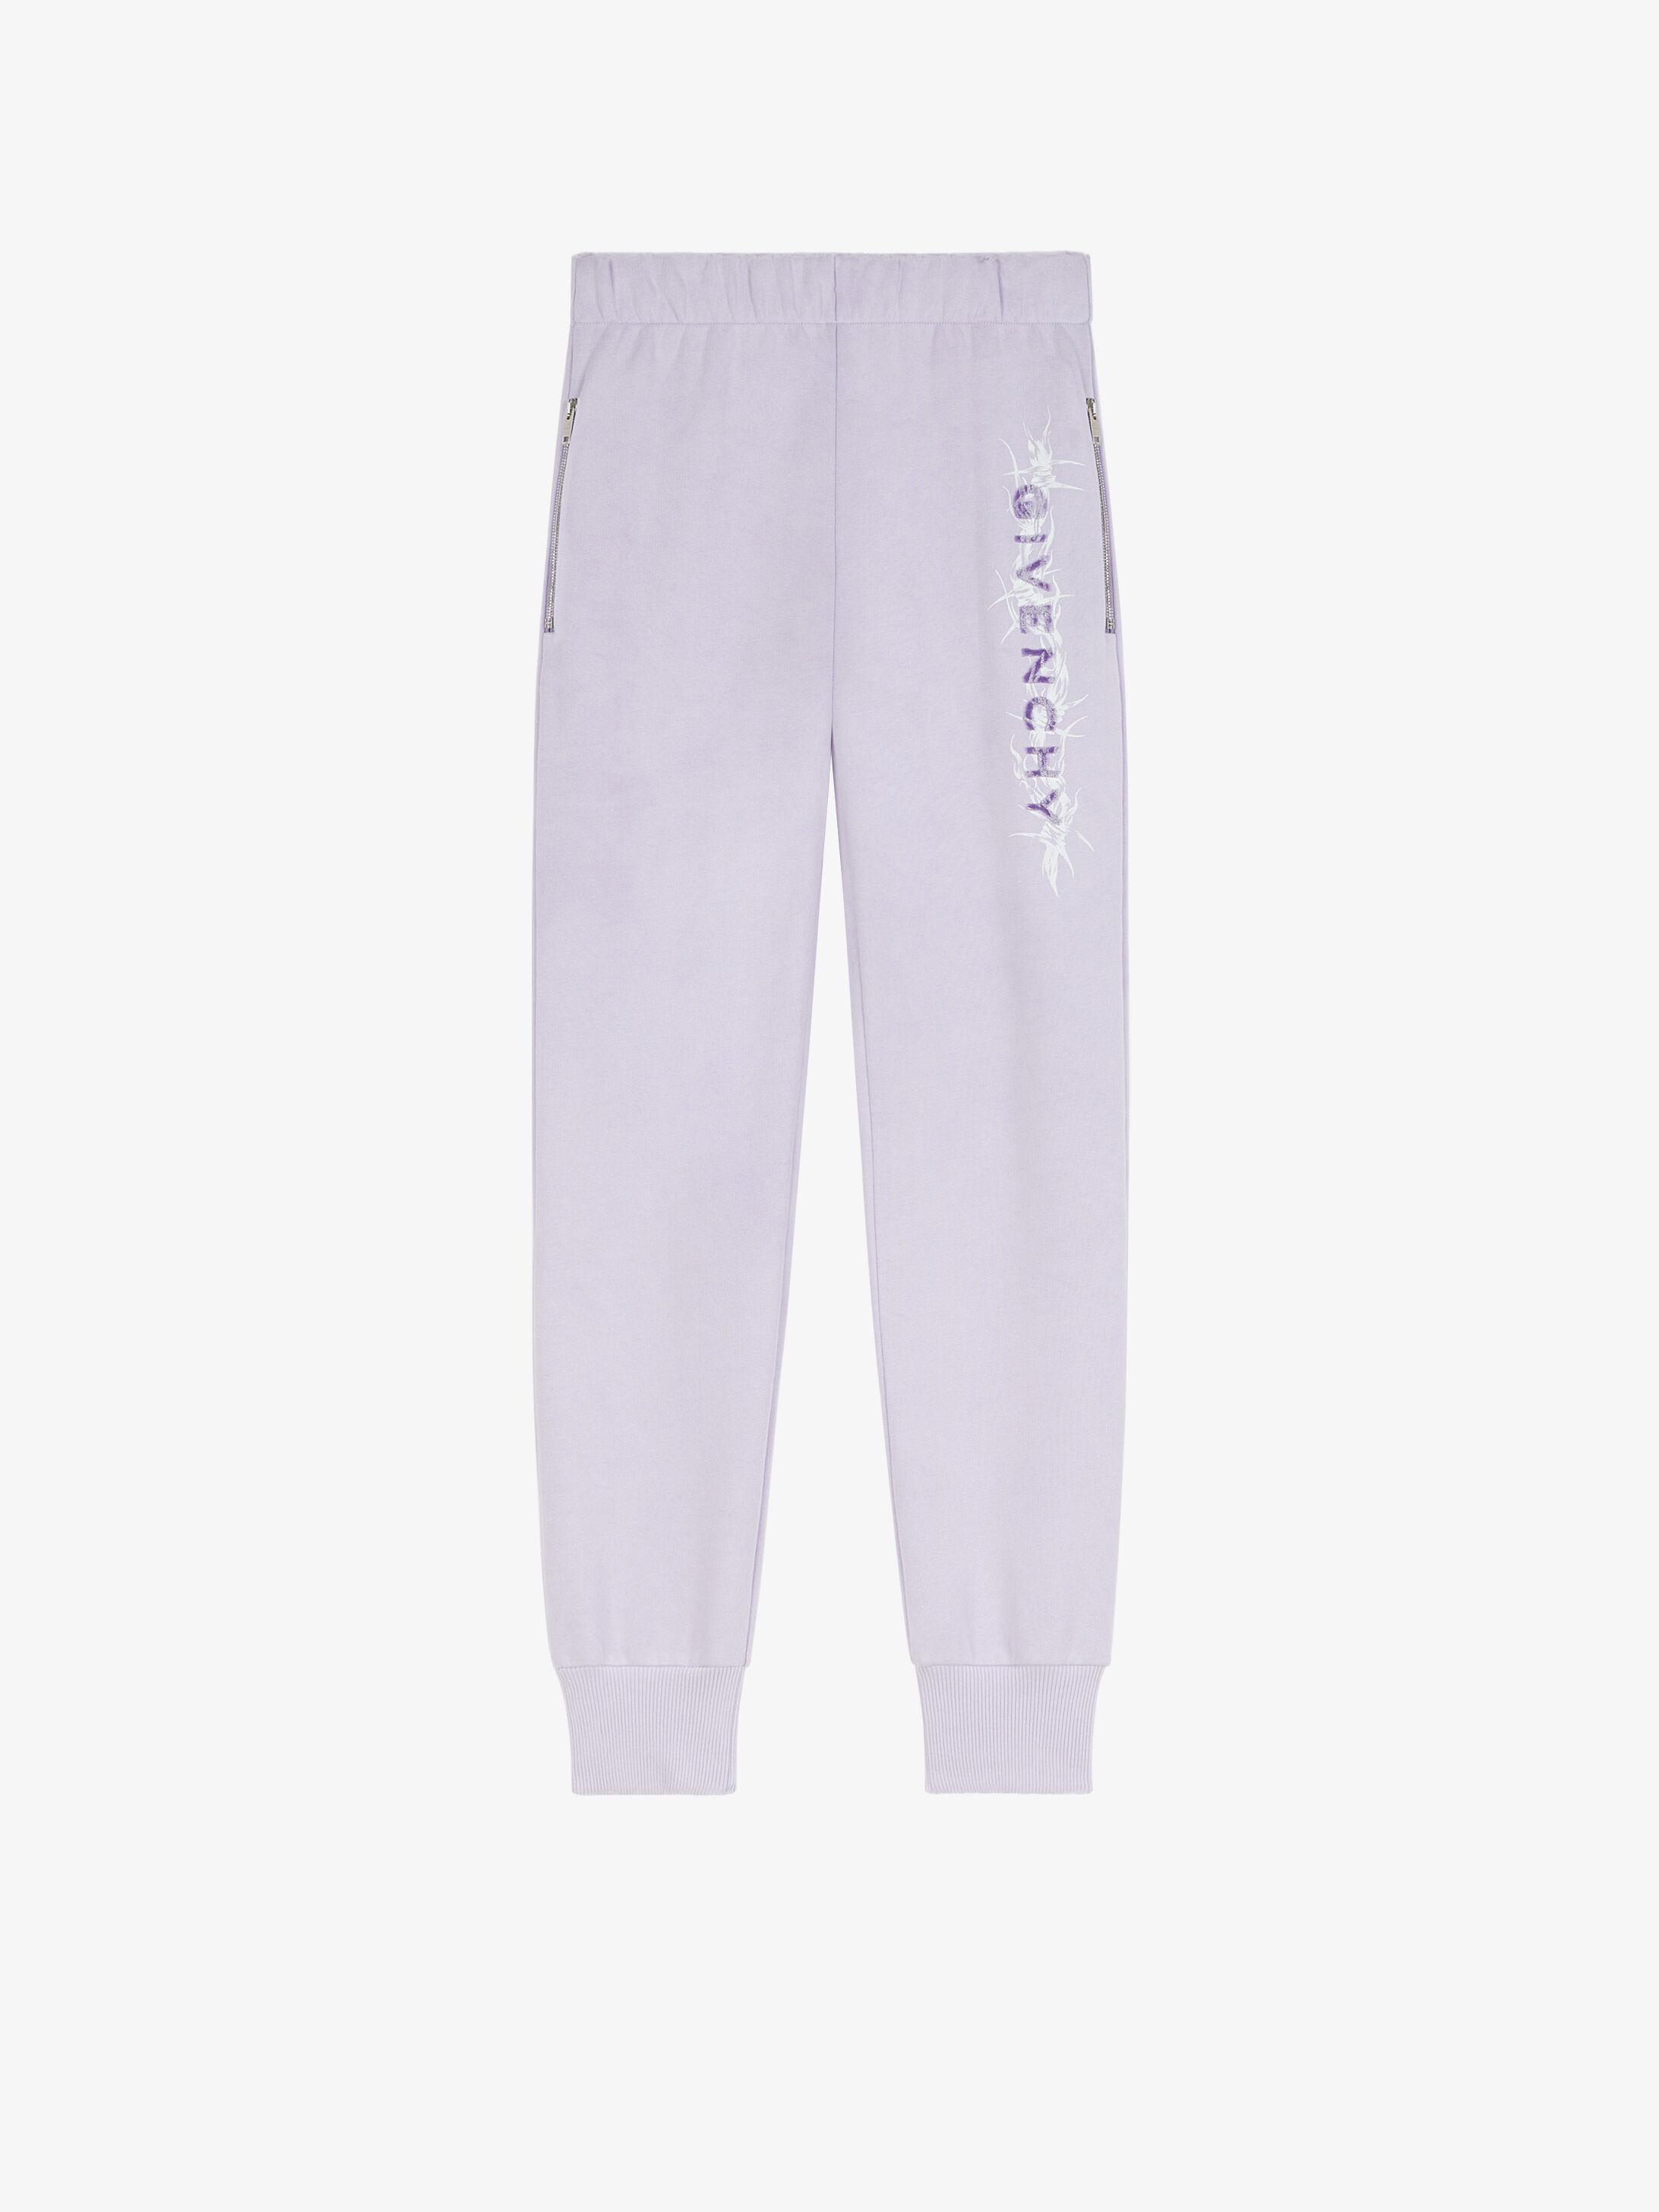 Pantaloni sportivi lilla in cotone con logo floccato Givenchy GIVENCHY | Pantaloni | BW50QL3Z77540